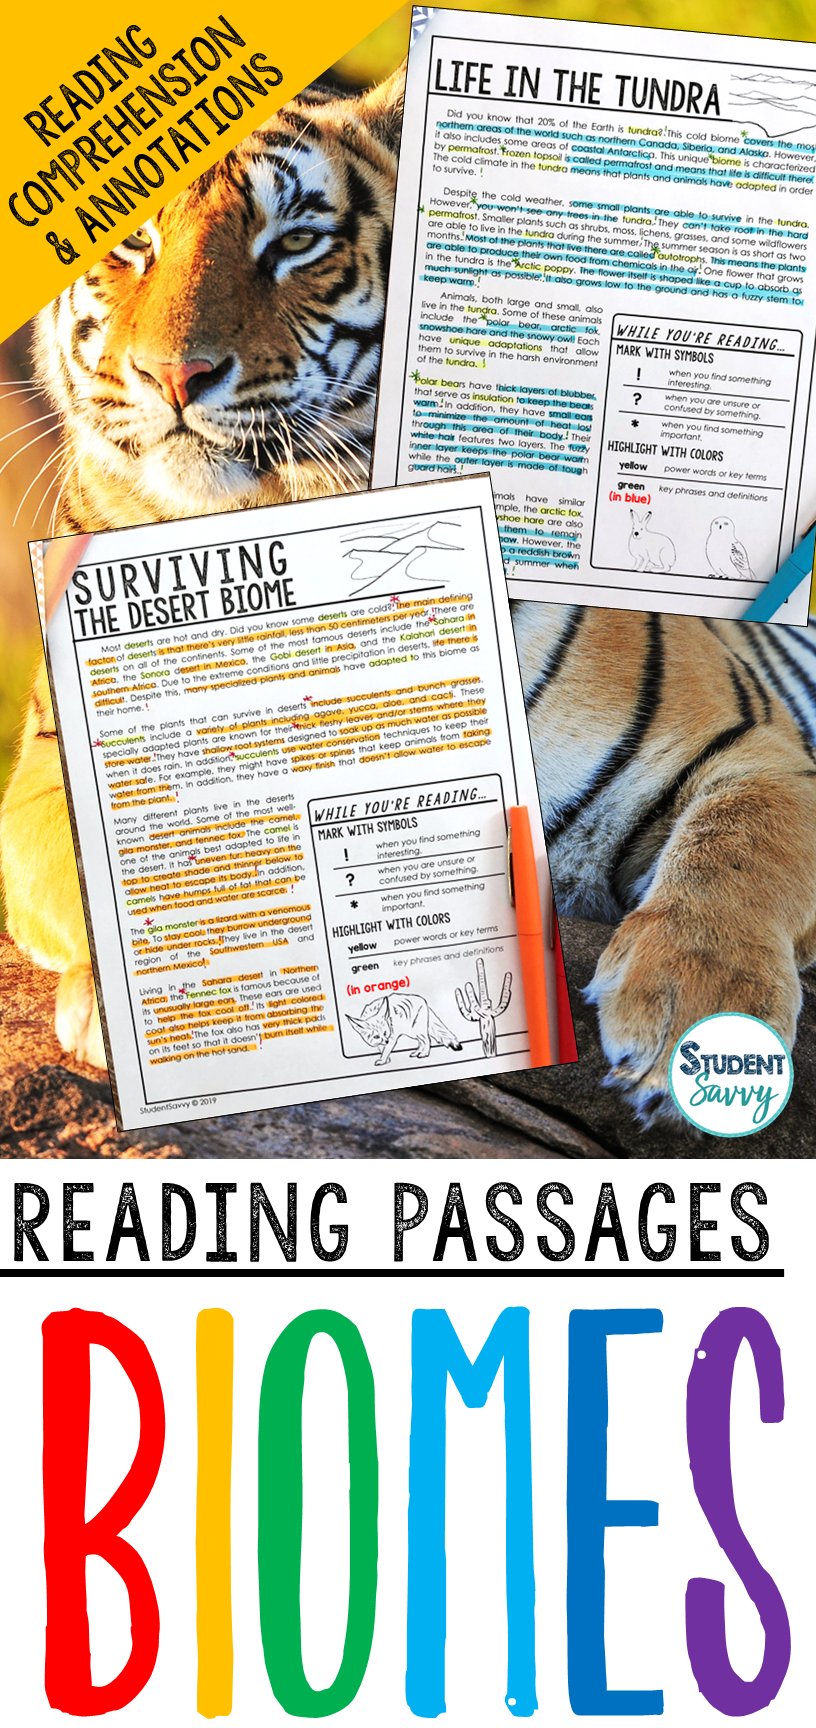 Biomes Reading Passages Reading Passages Reading Comprehension Questions Comprehension Passage [ 1728 x 816 Pixel ]